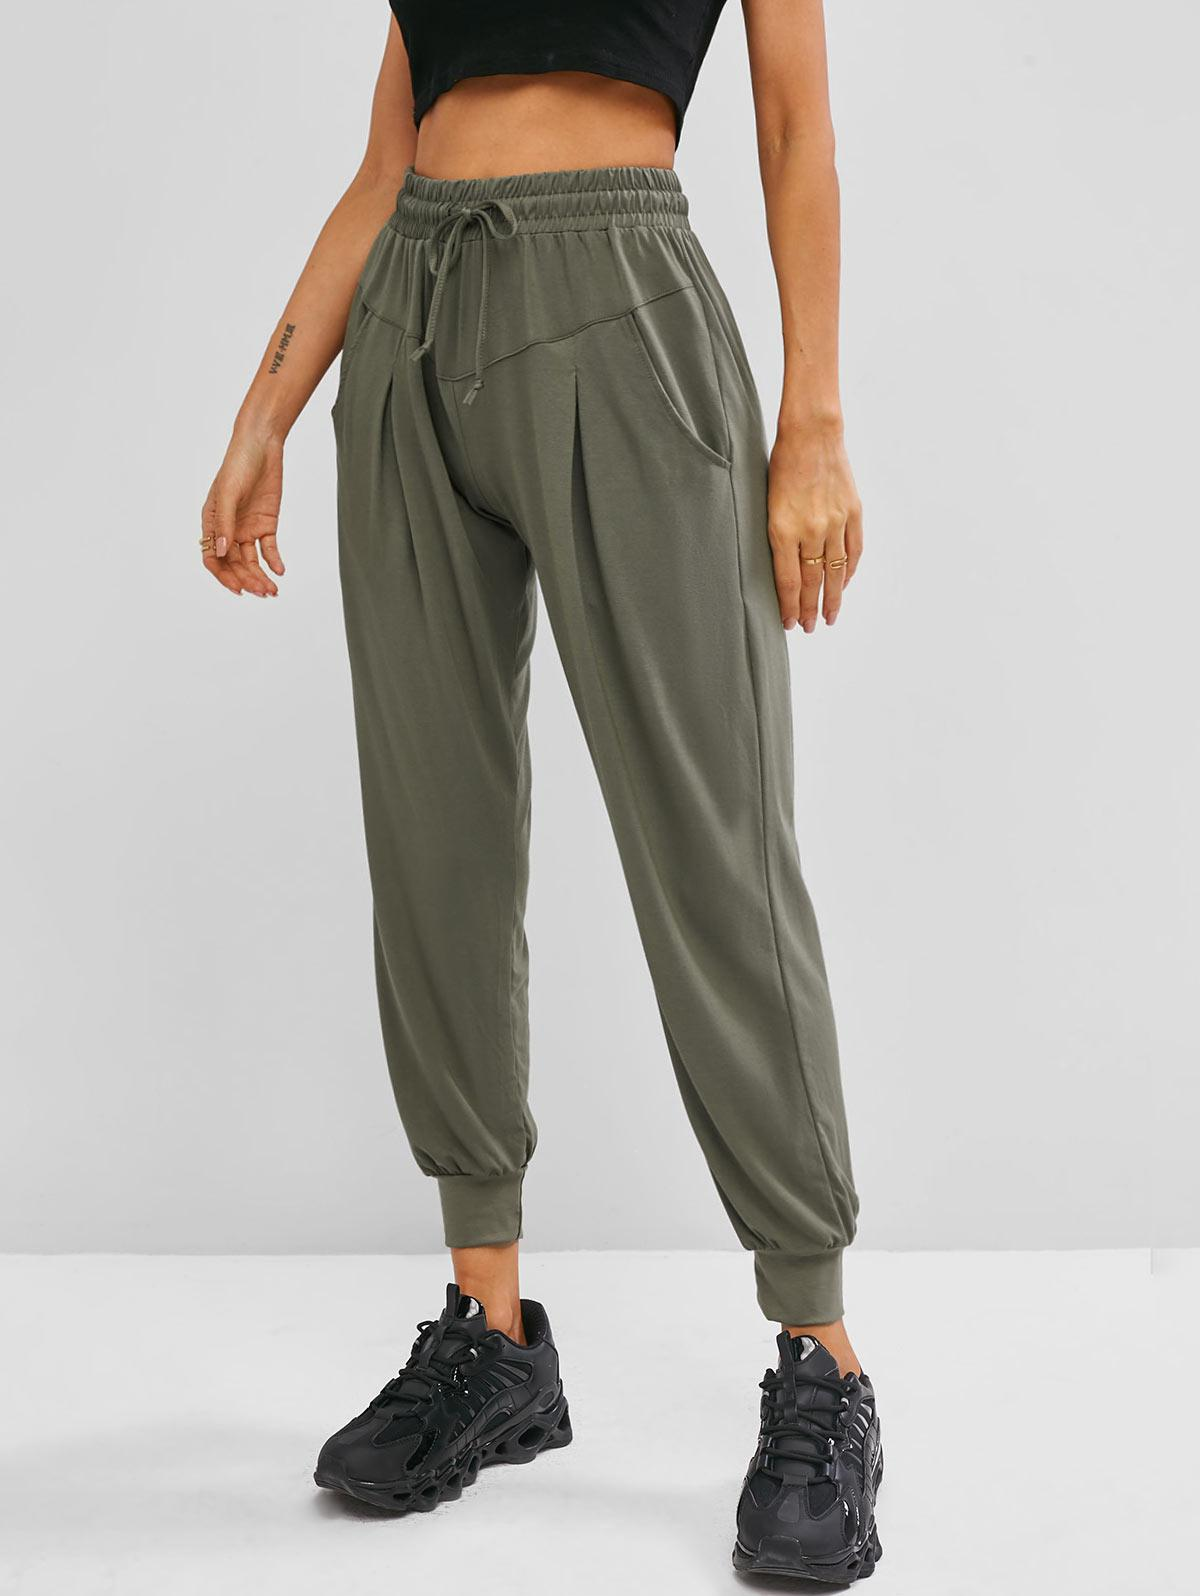 Drawstring High Waisted Slant Pockets Sweatpants